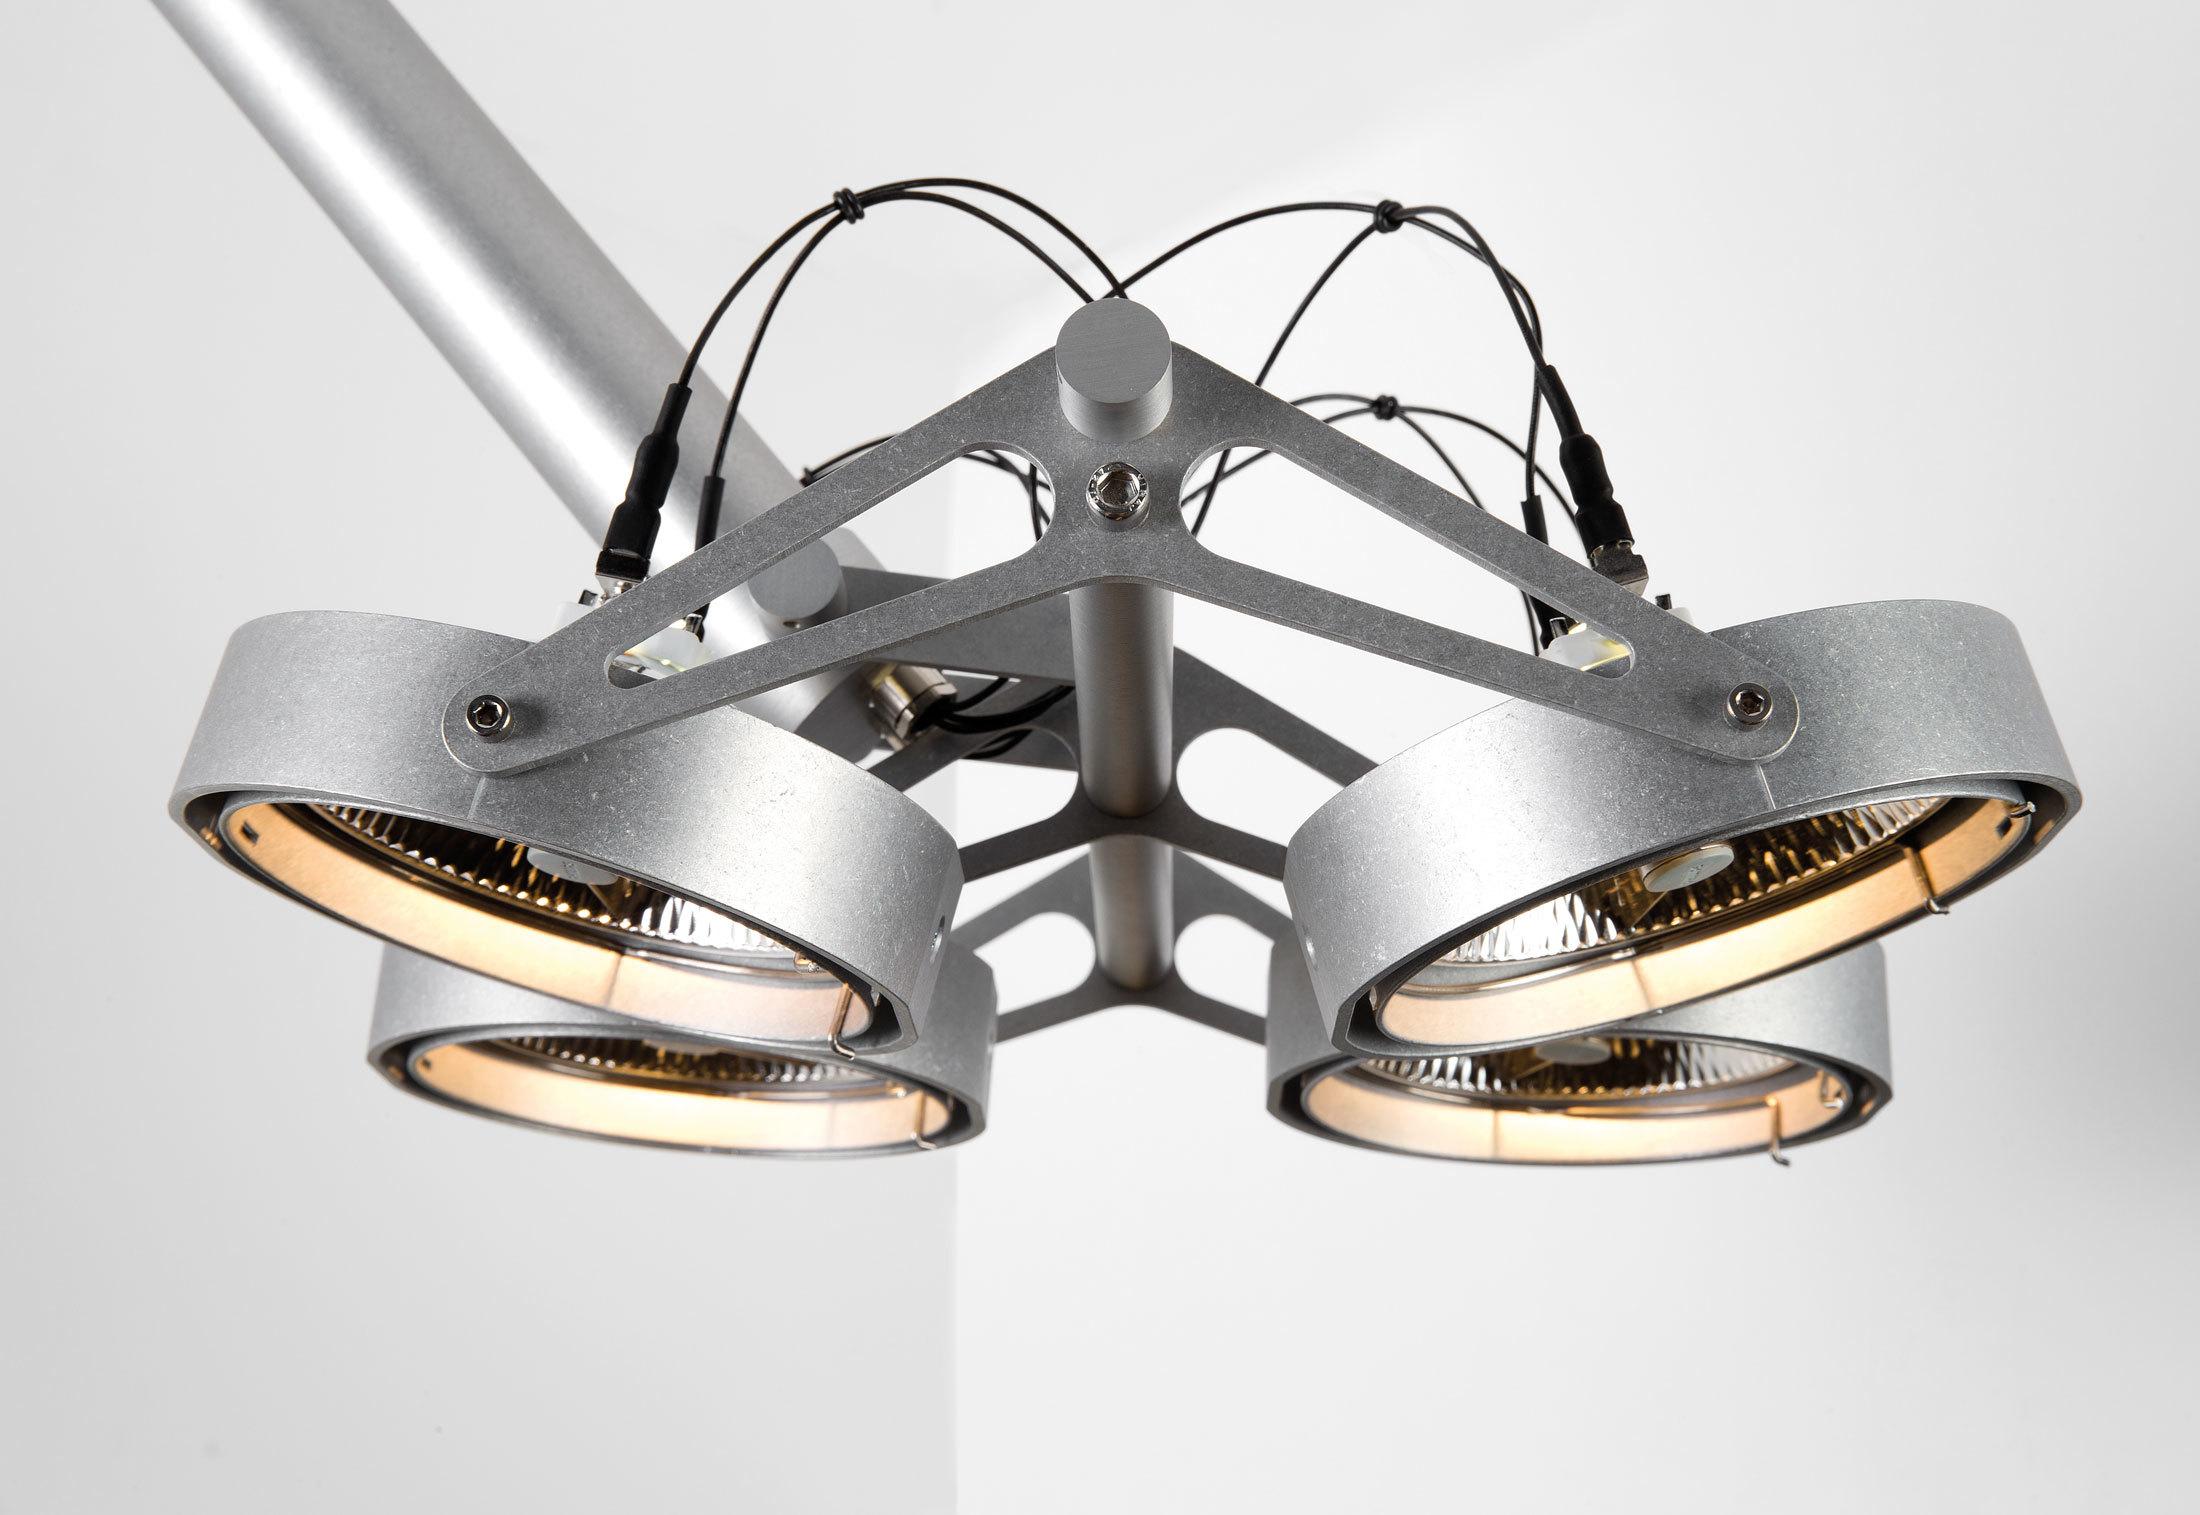 Modular Nomad Lamp : Nomad by modular lighting instruments stylepark